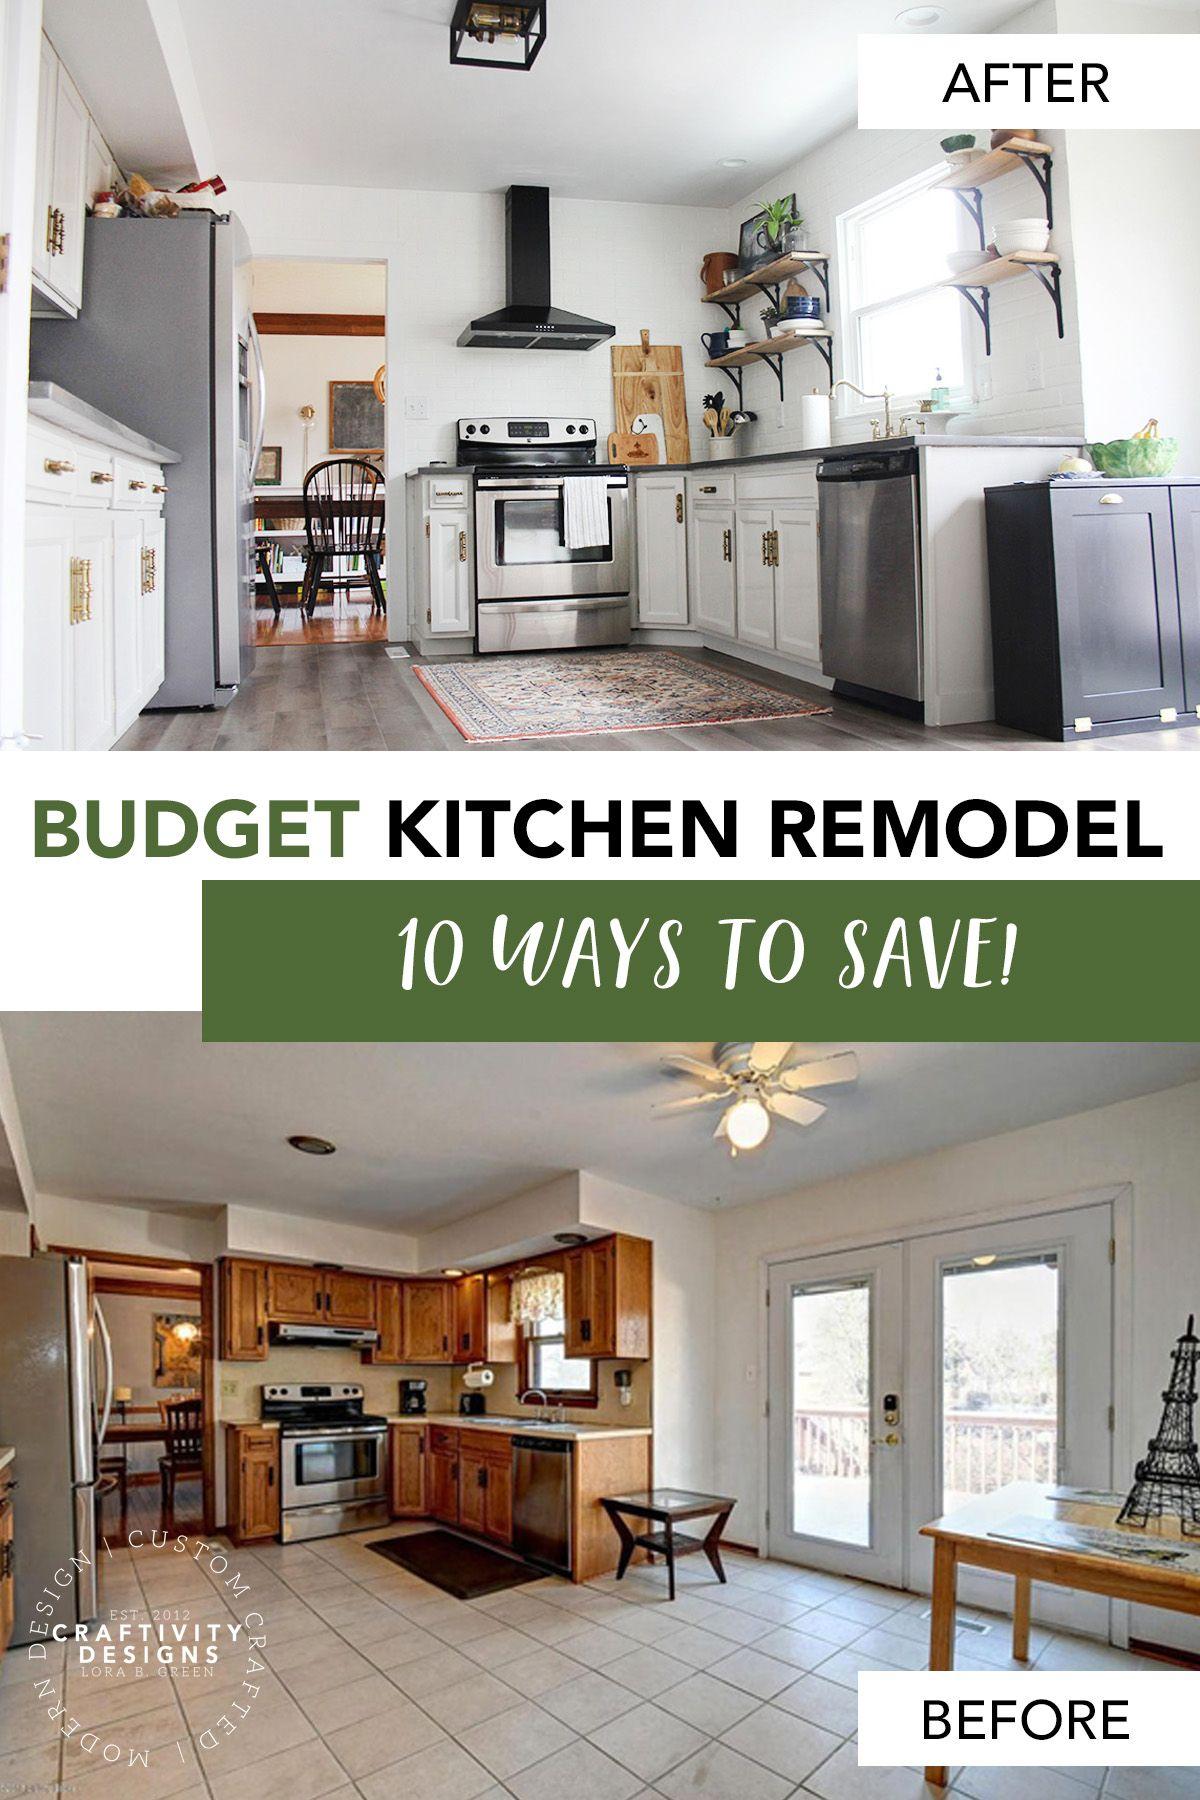 10 Ways To Save Money During A Budget Kitchen Remodel Budget Kitchen Remodel Kitchen Remodel Small Kitchen Remodel